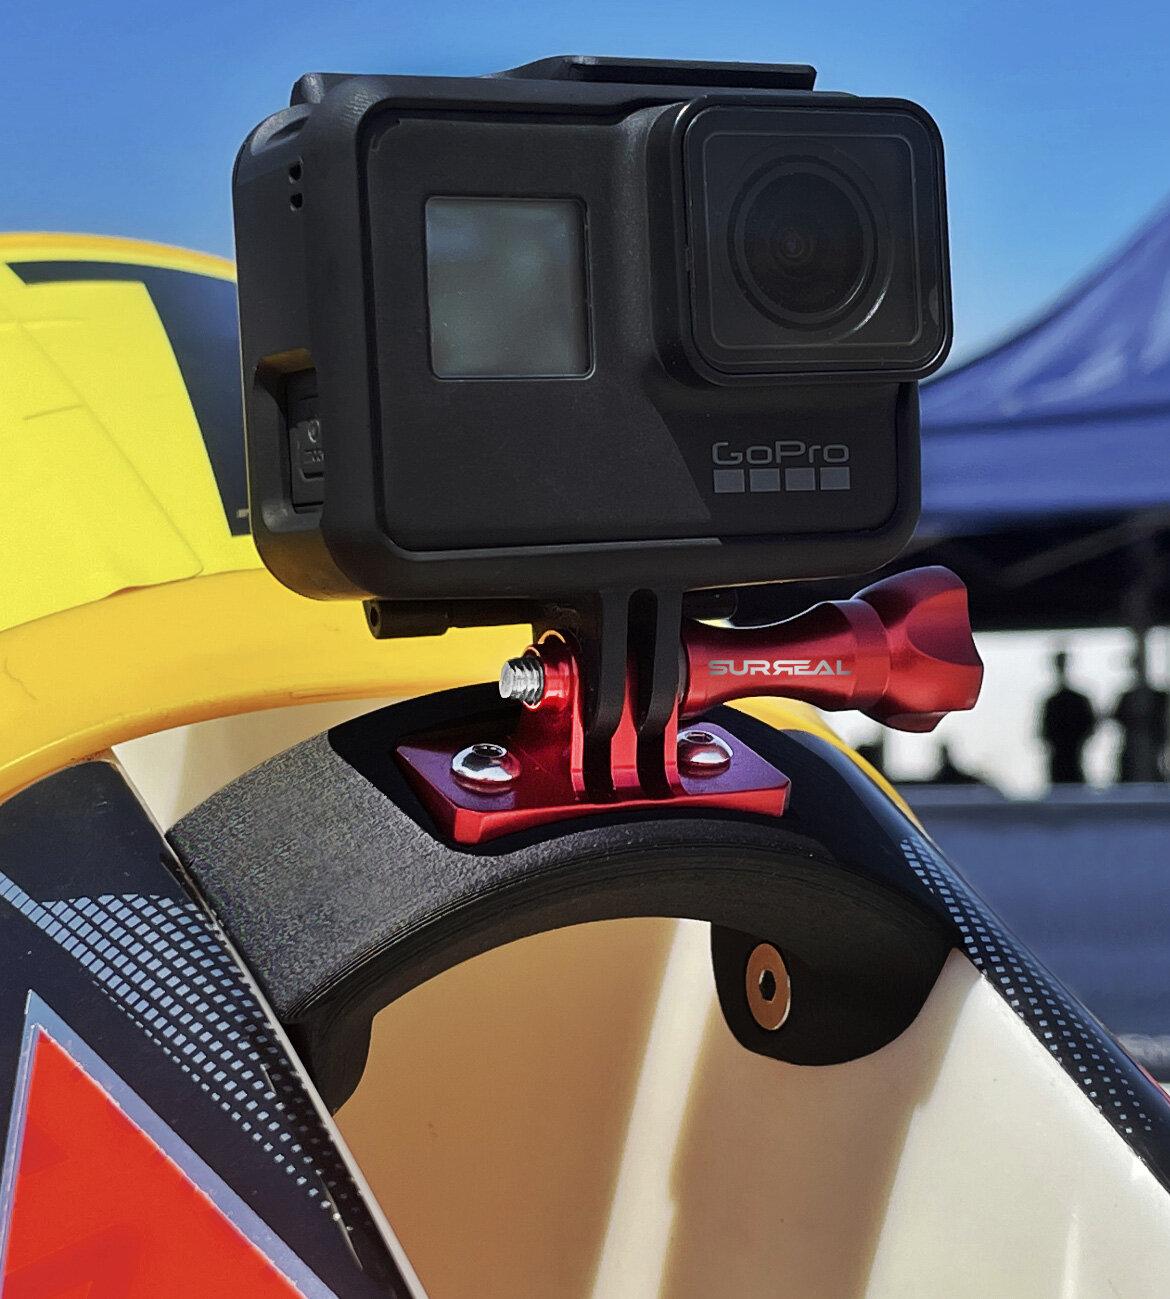 www.surrealmotorsport.com